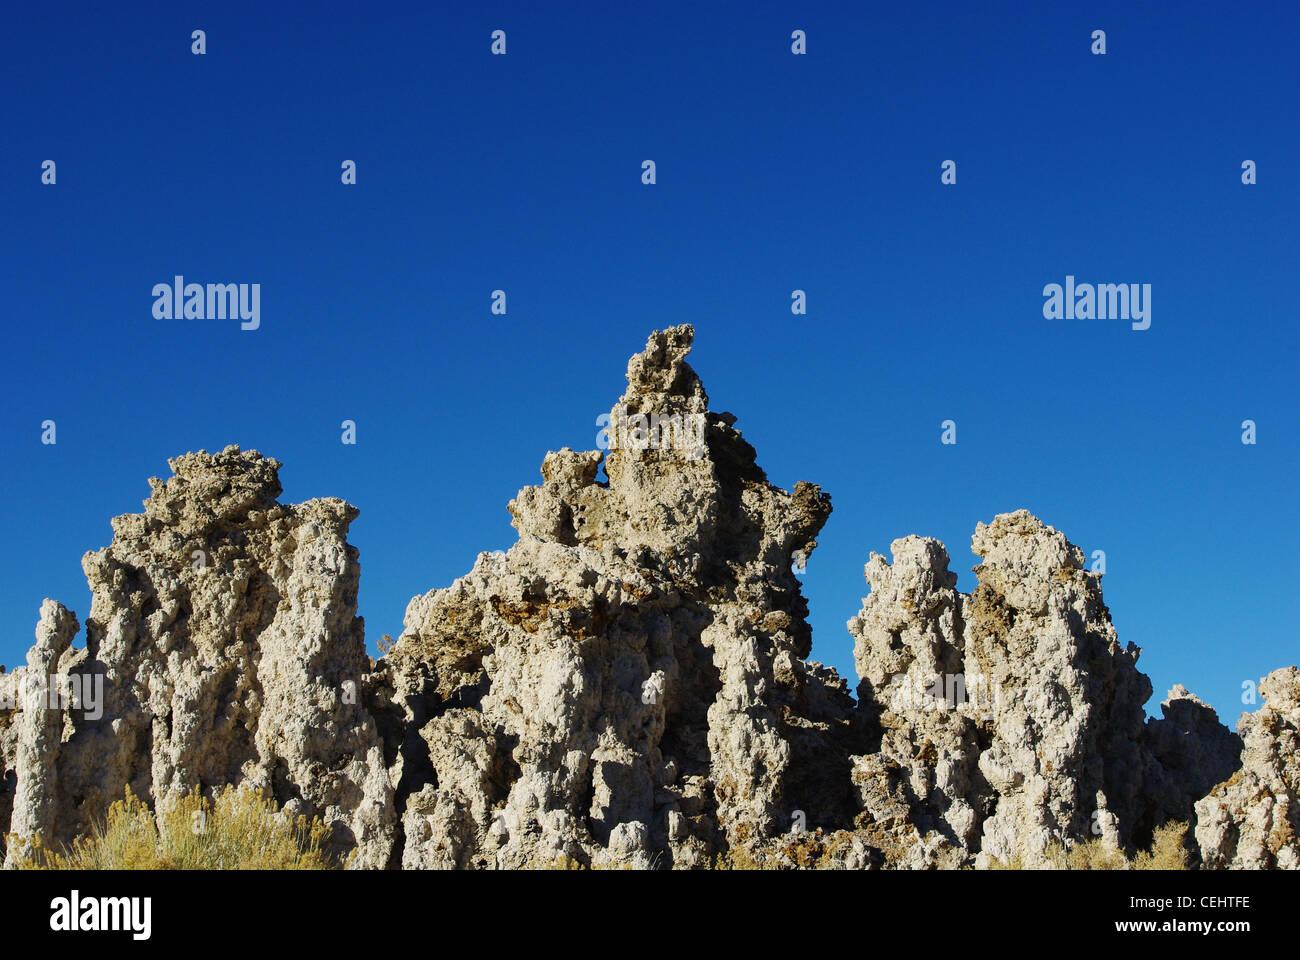 Tufa formations, Mono Lake, California - Stock Image